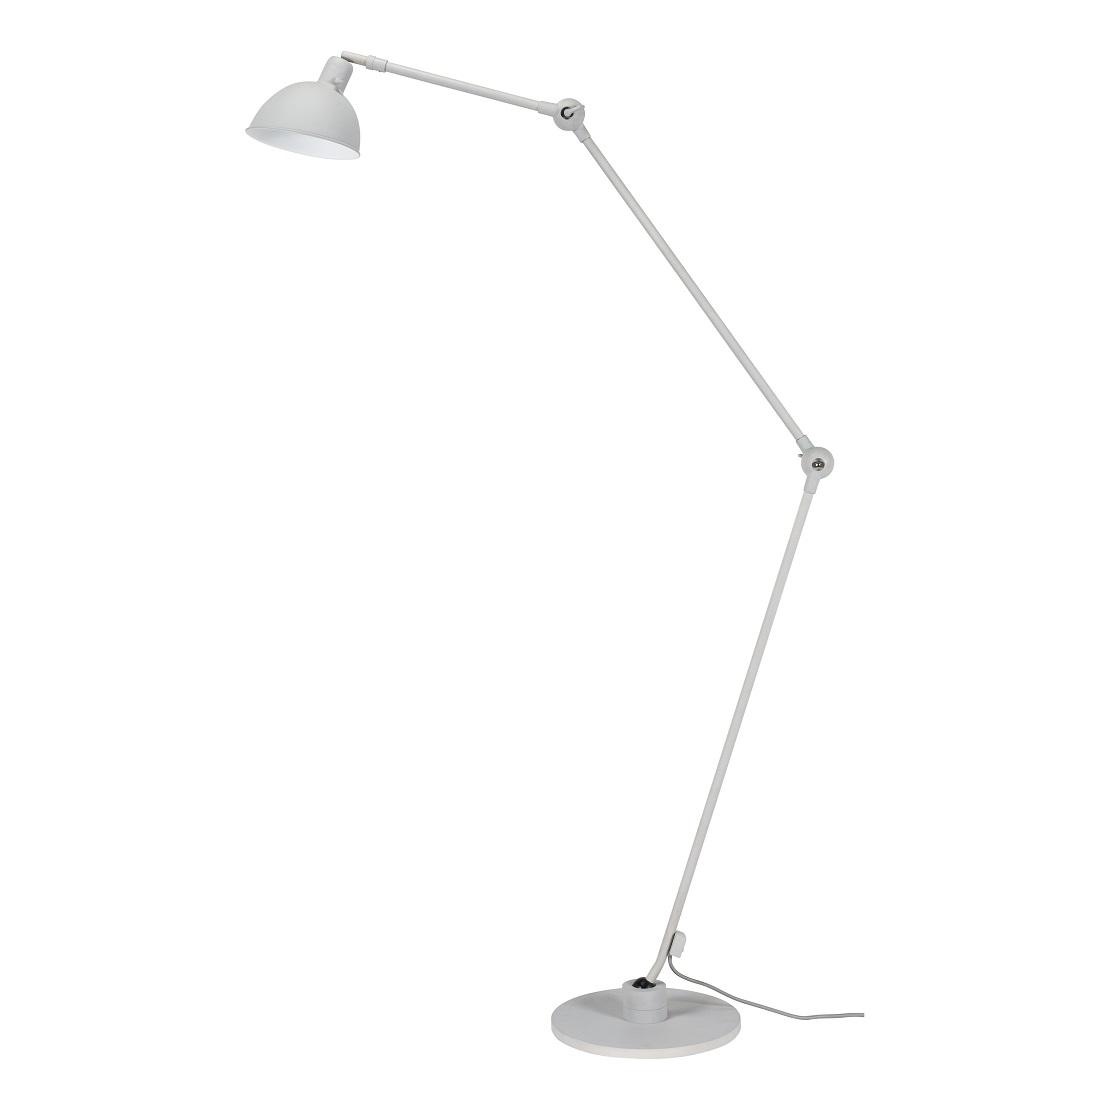 Bodilson Dixie vloerlamp-Licht grijs